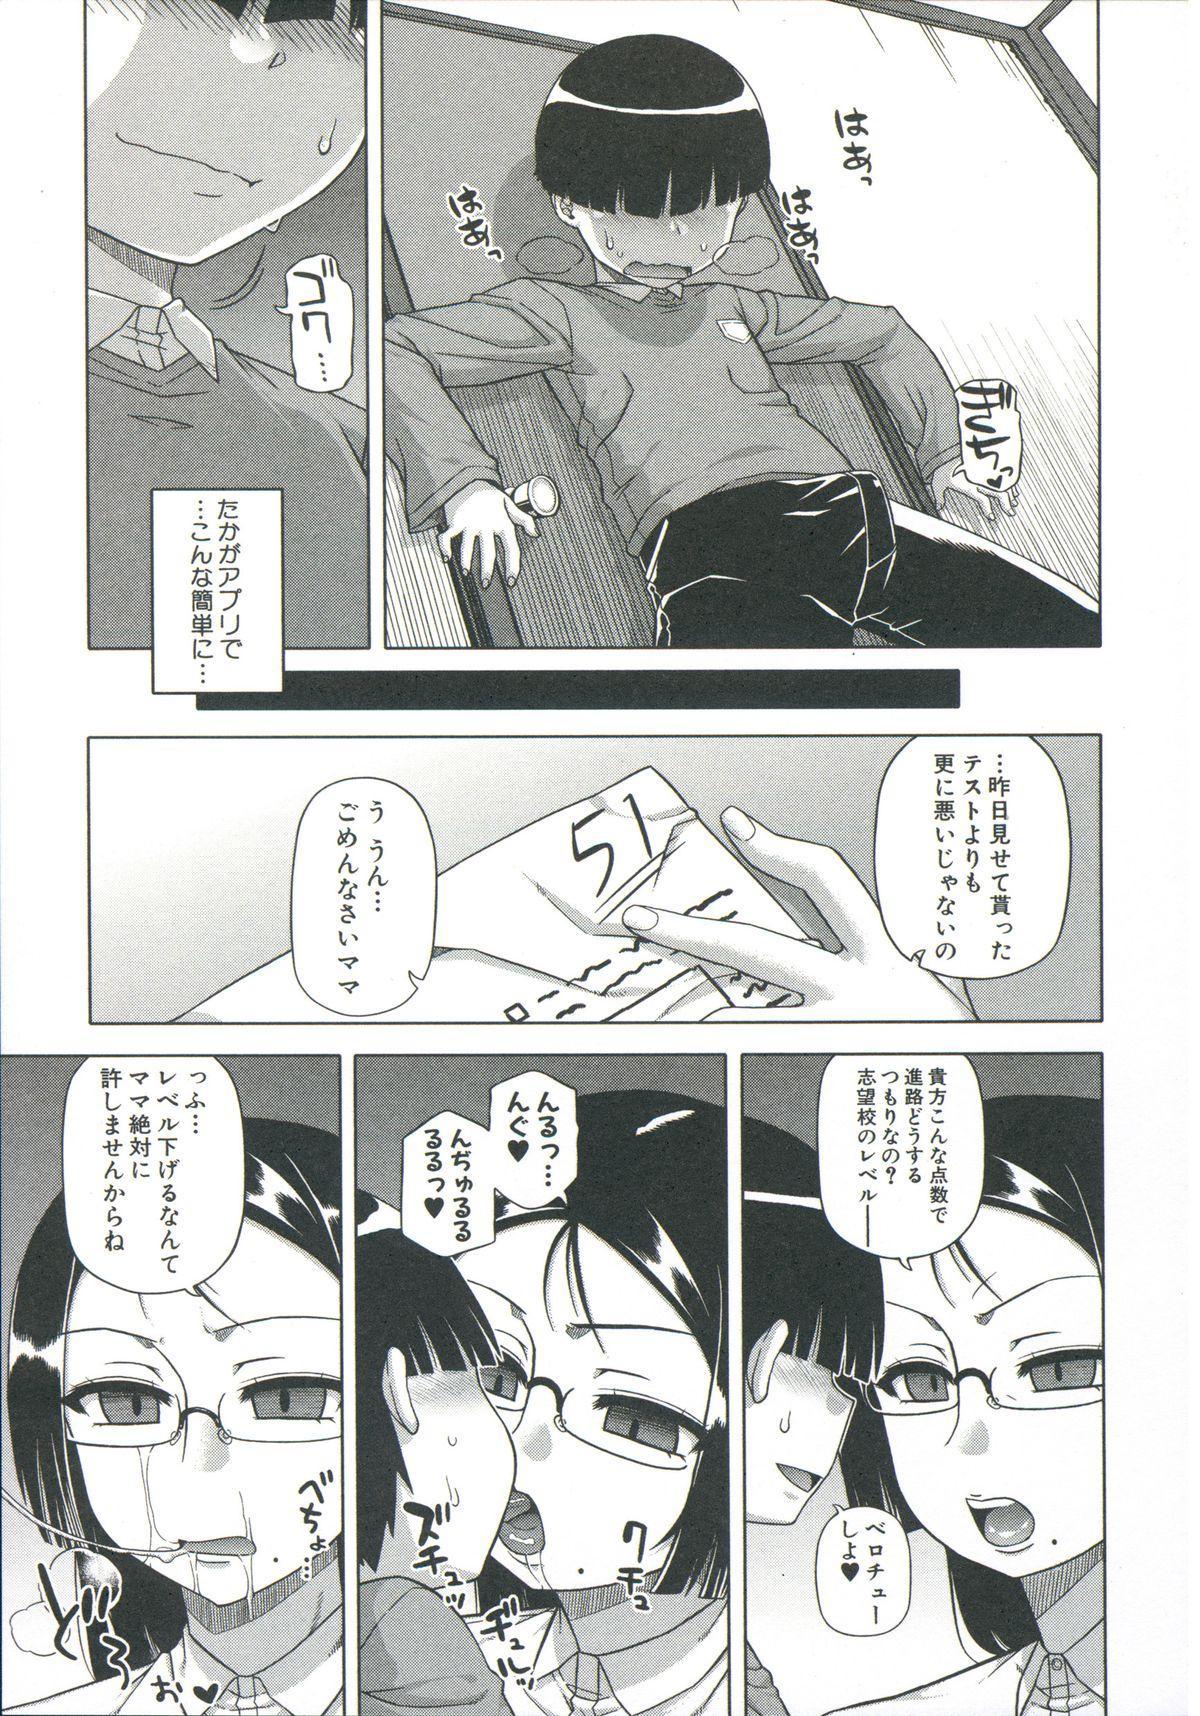 [Takatsu] Ou-sama Appli - King App 17